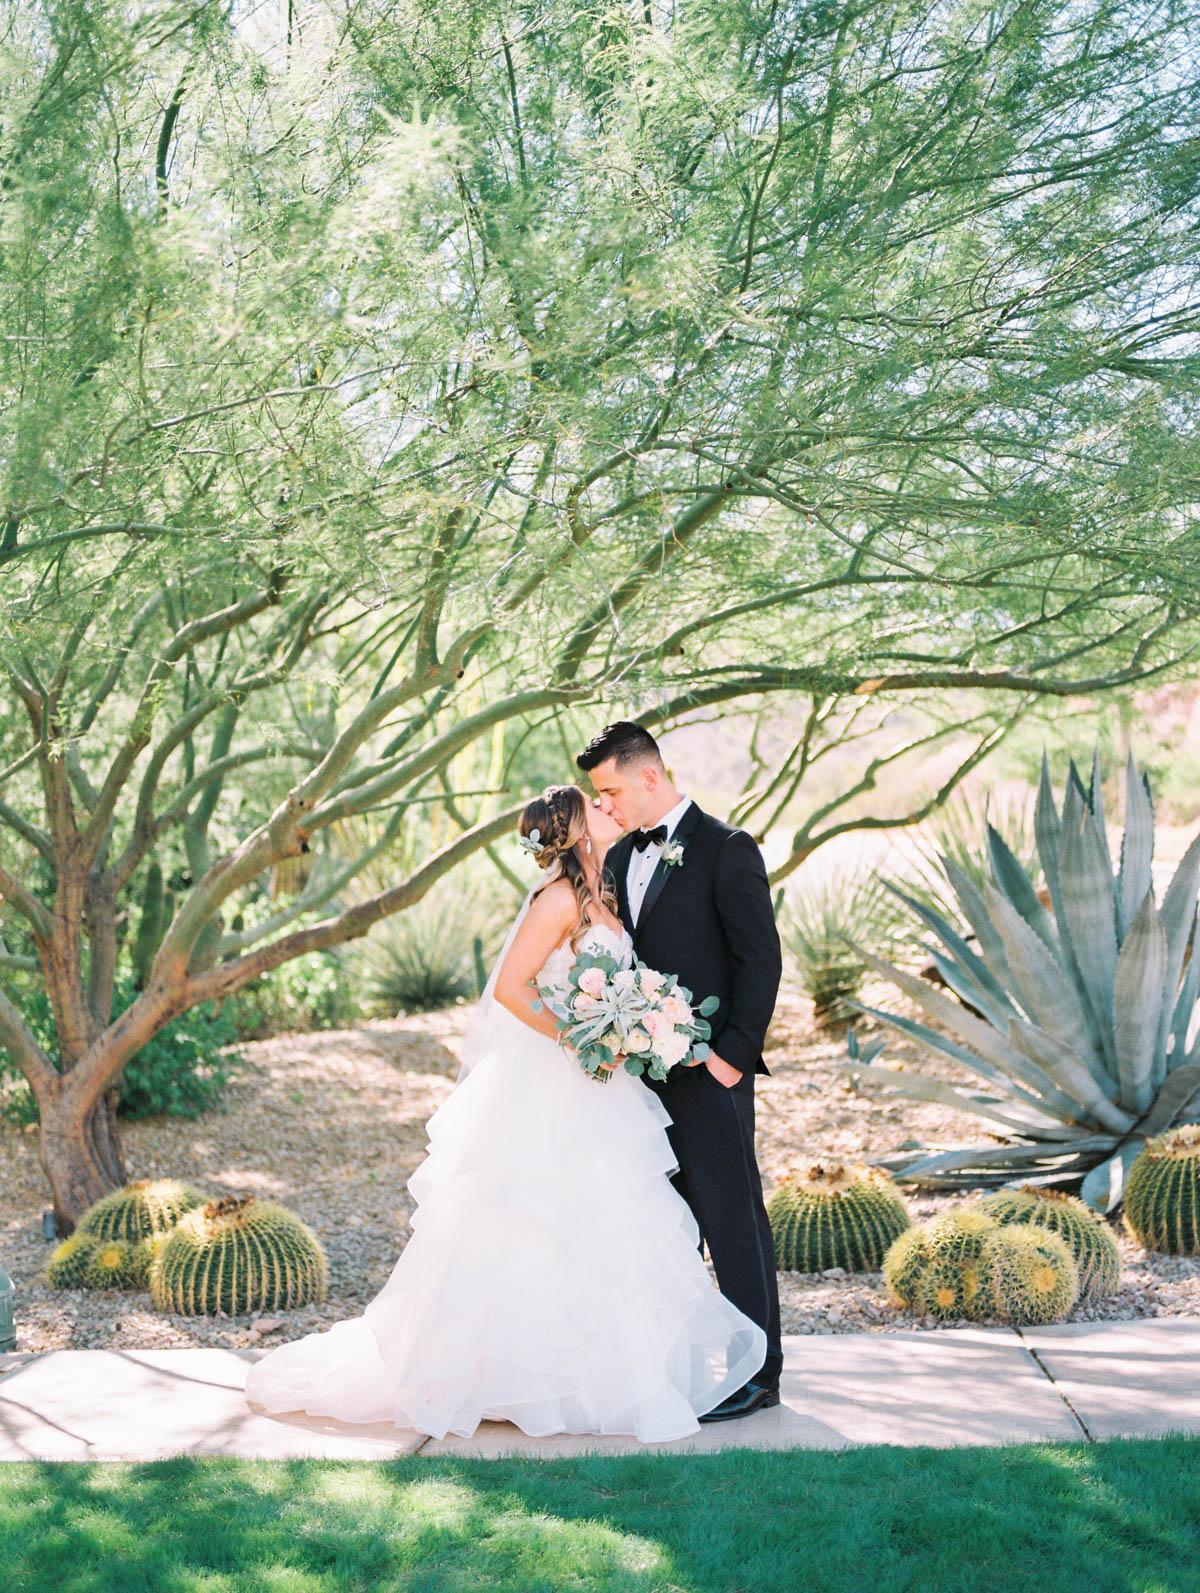 Bride & groom at JW Marriott Starr Pass captured by Tucson Wedding Photographers Betsy & John